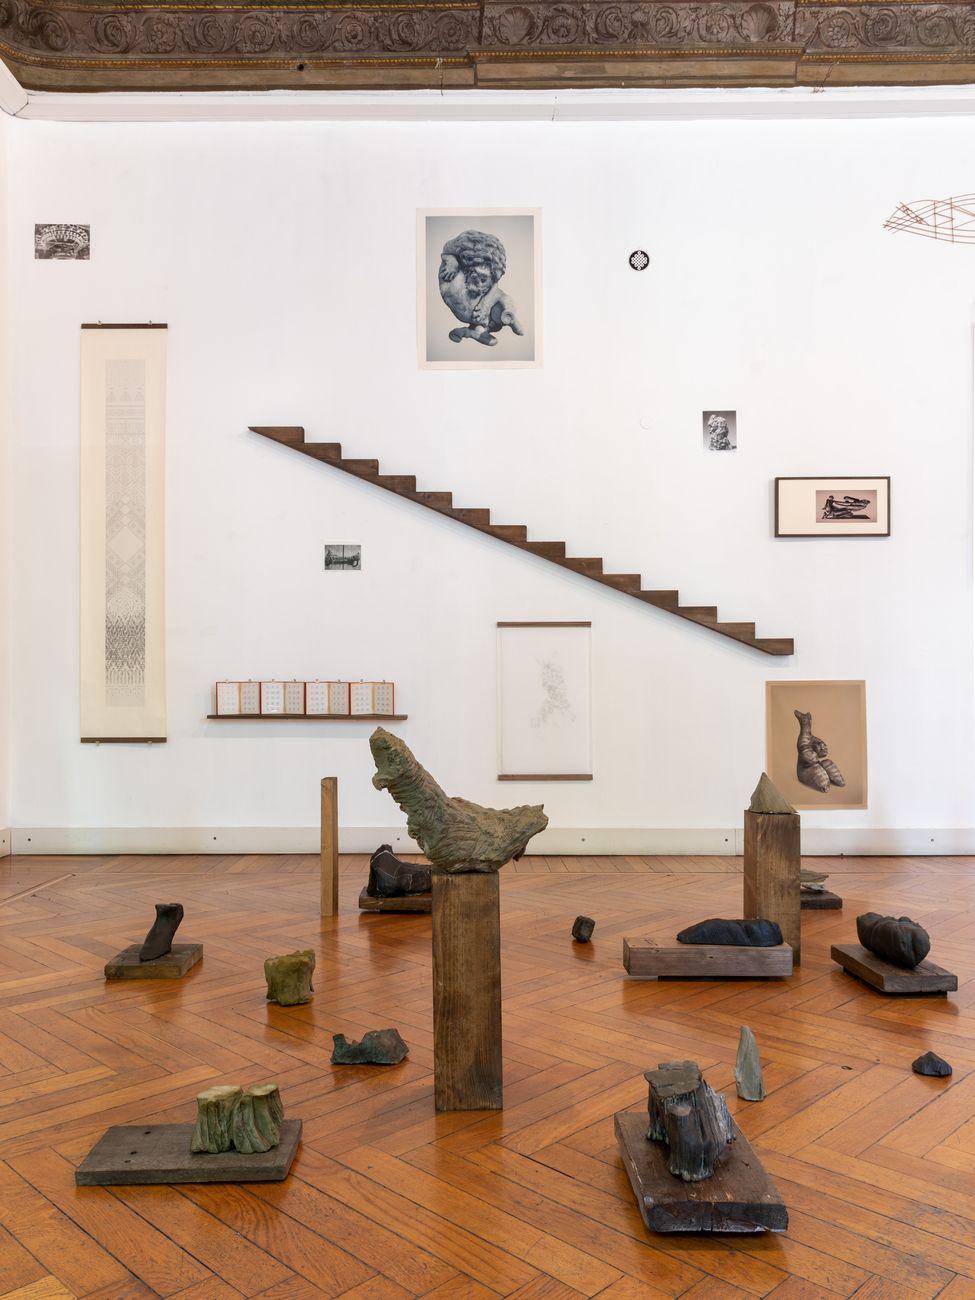 Riccardo Arena. Hyphae. Exhibition view at Galleria Milano, Milano 2021. Photo Roberto Marossi